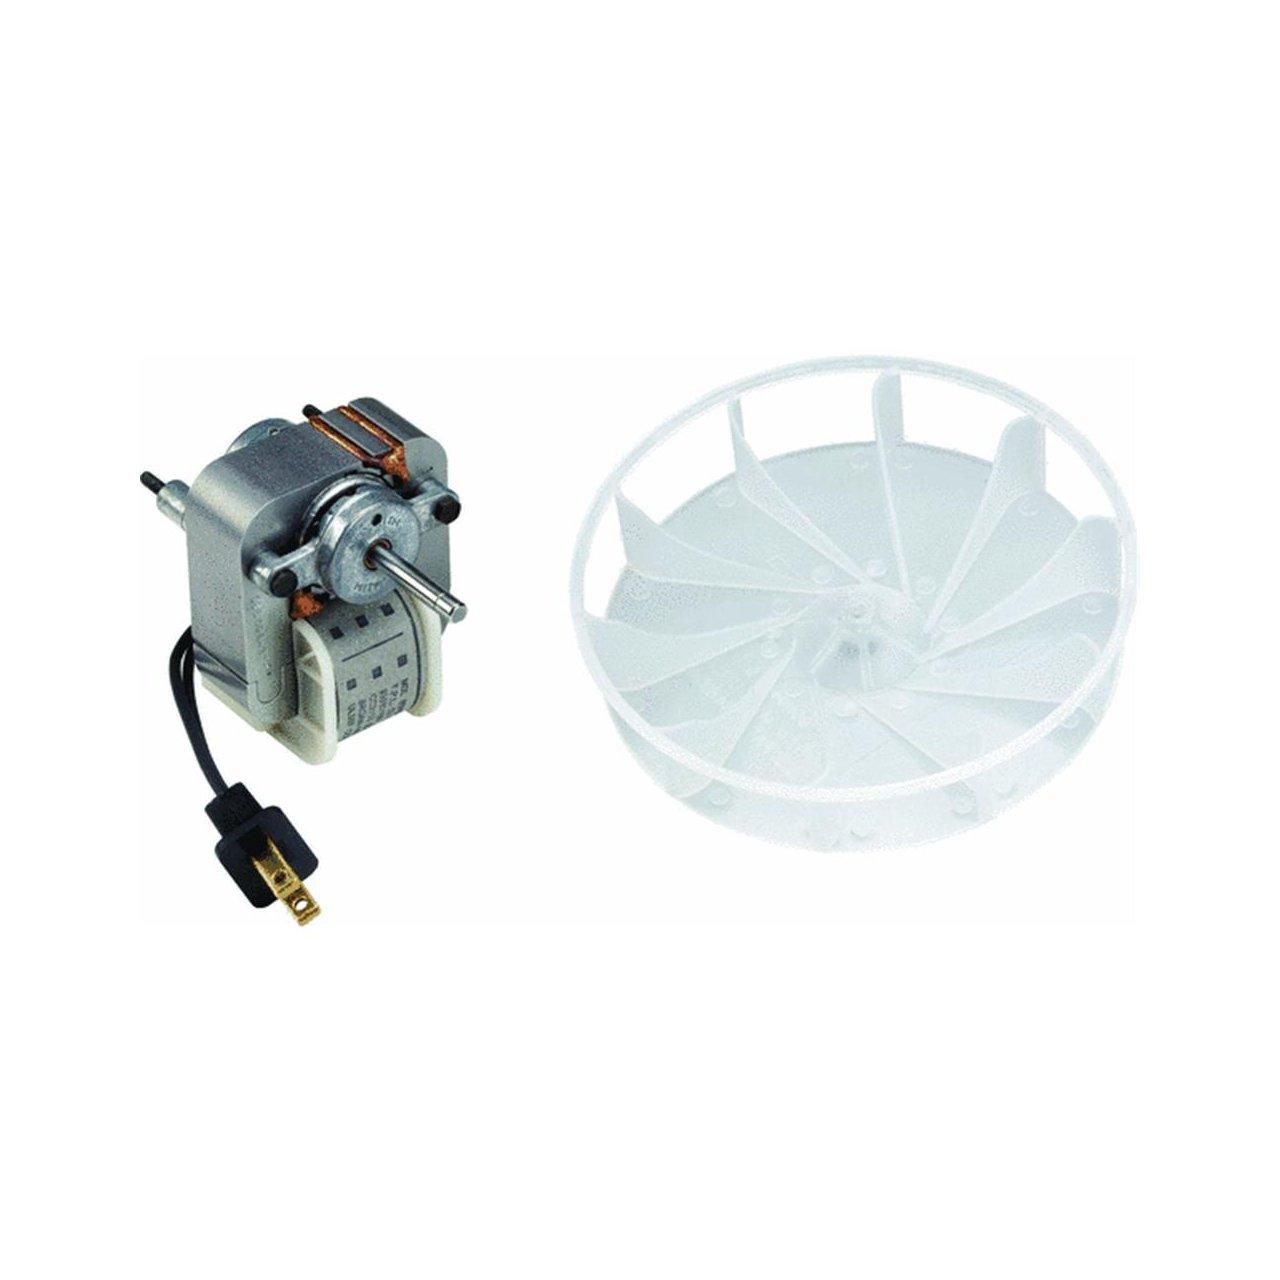 Ordinaire Broan Nutone BP51 70 CFM Motor/Wheel For 694 And 695 Ver. A   Range Hoods    Amazon.com